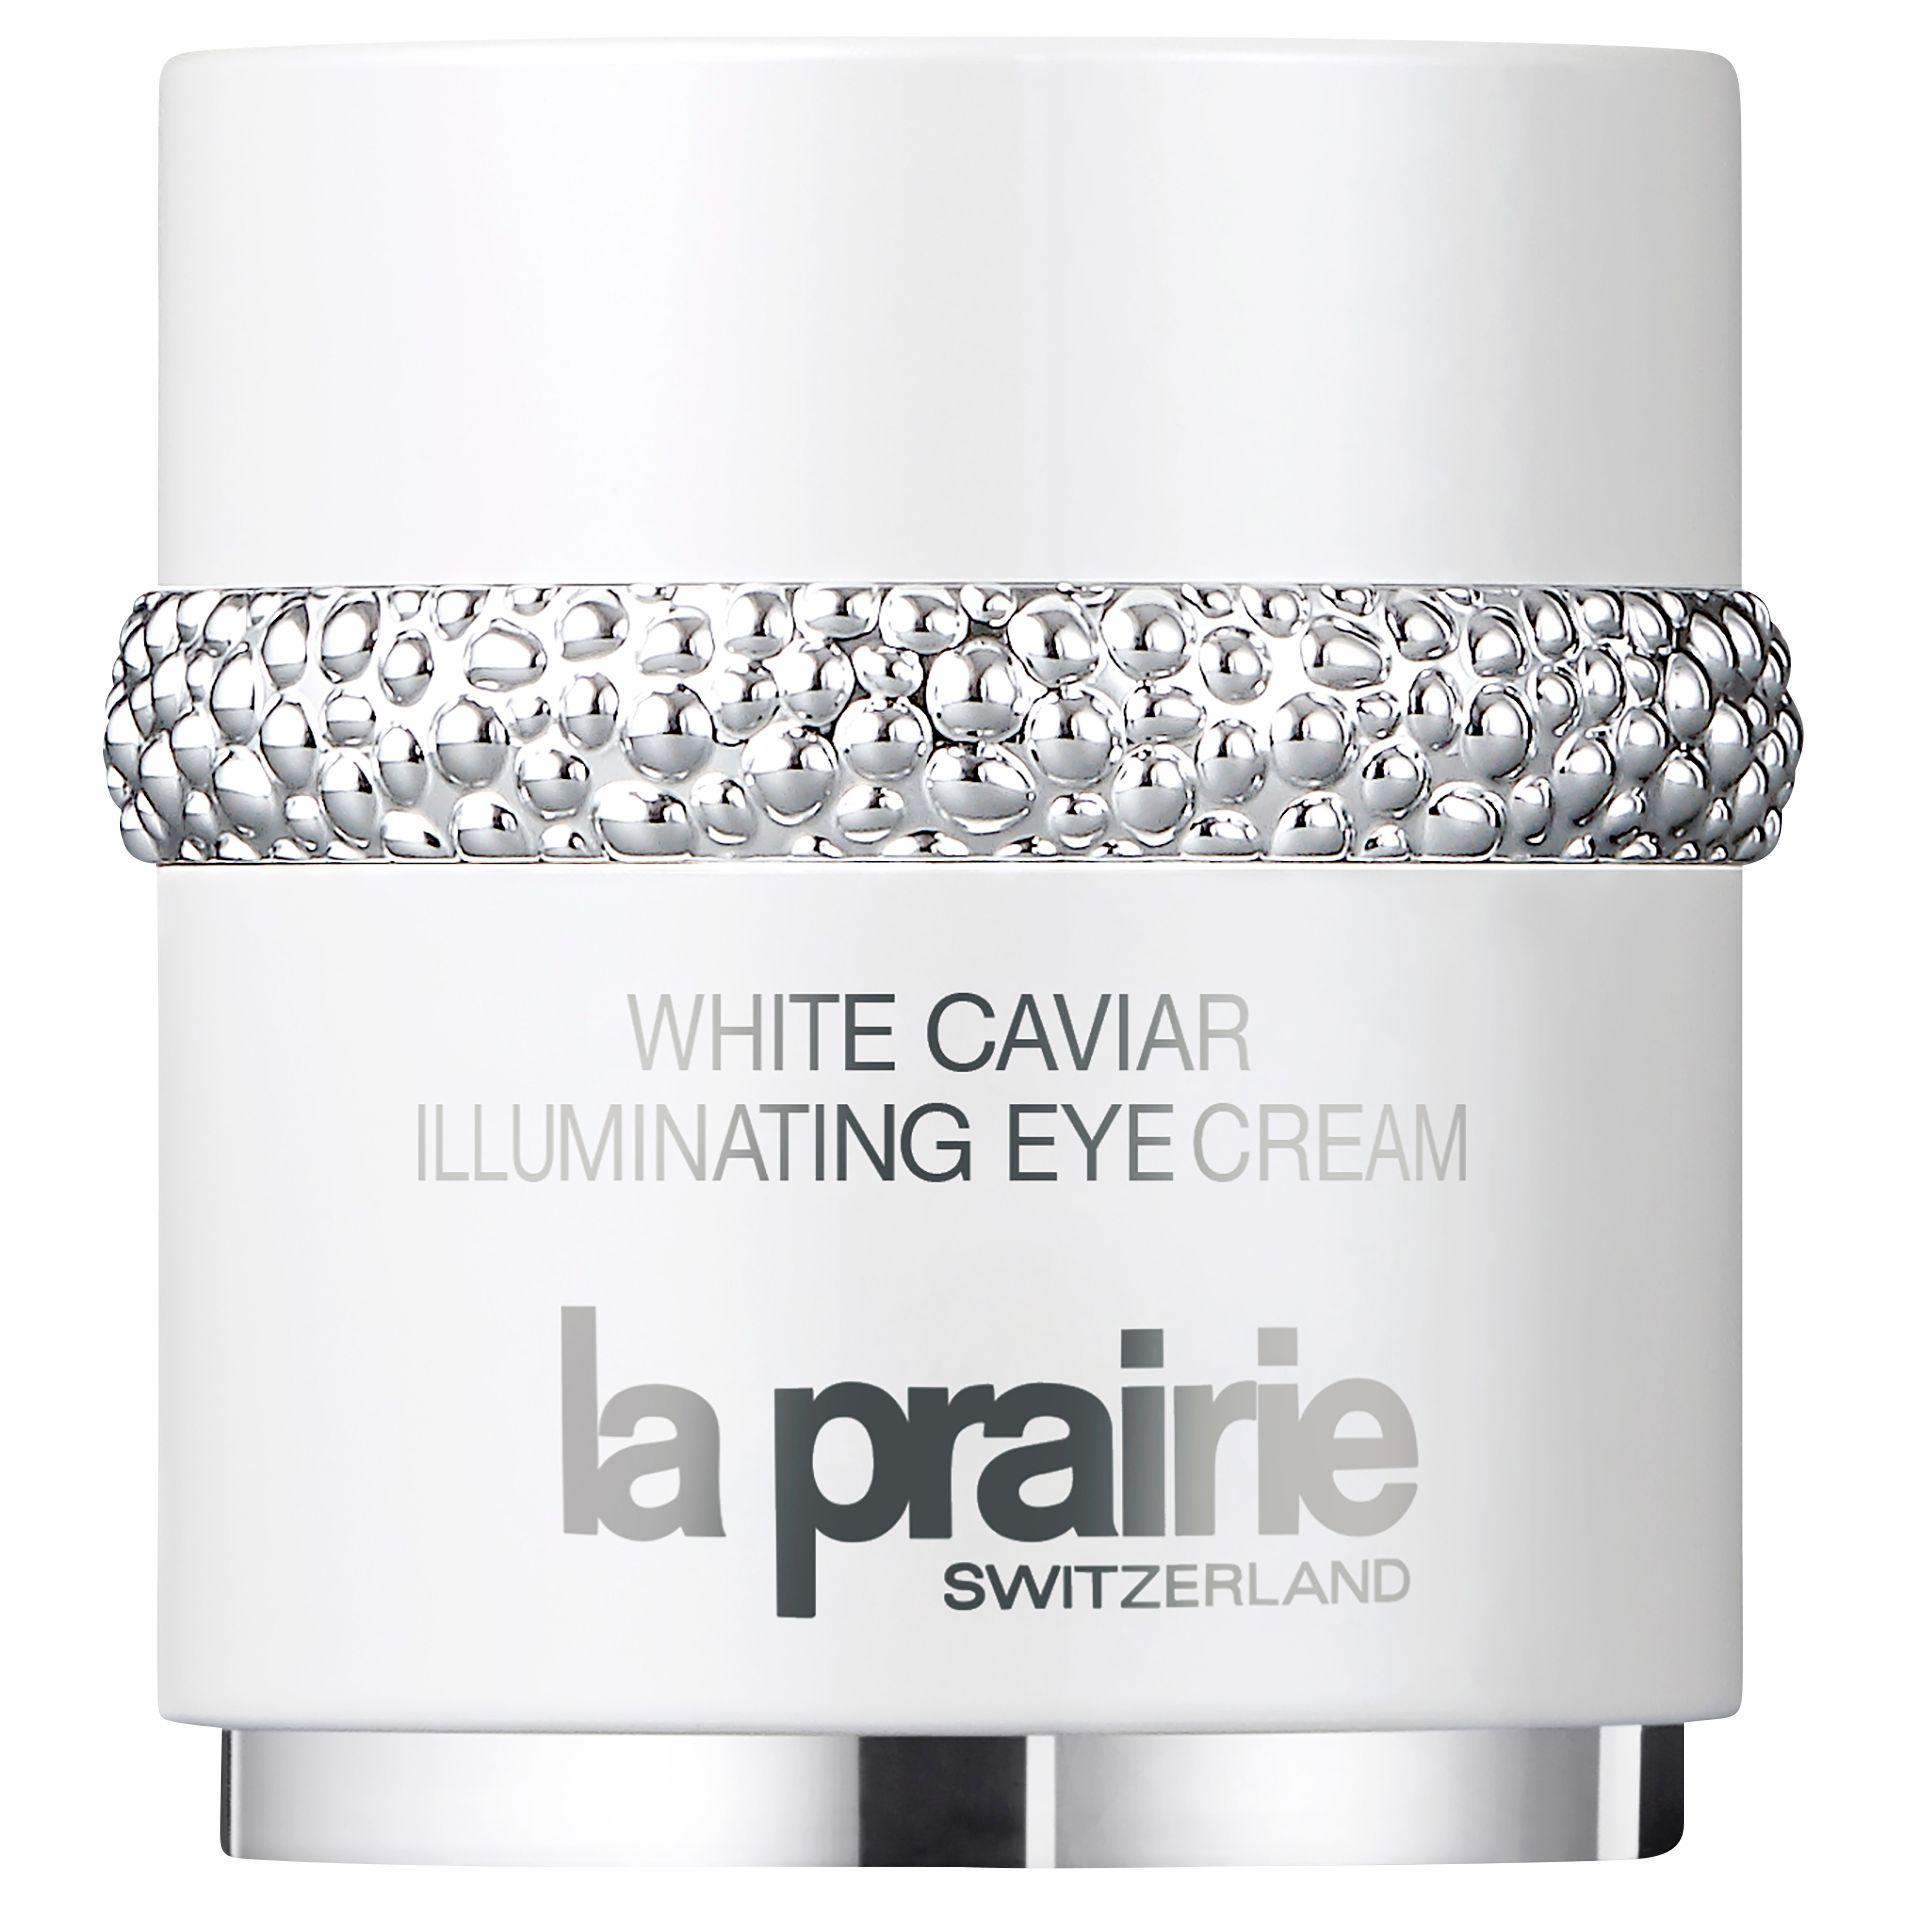 dc38713e29892 La Prairie White Caviar Illuminating Eye Cream